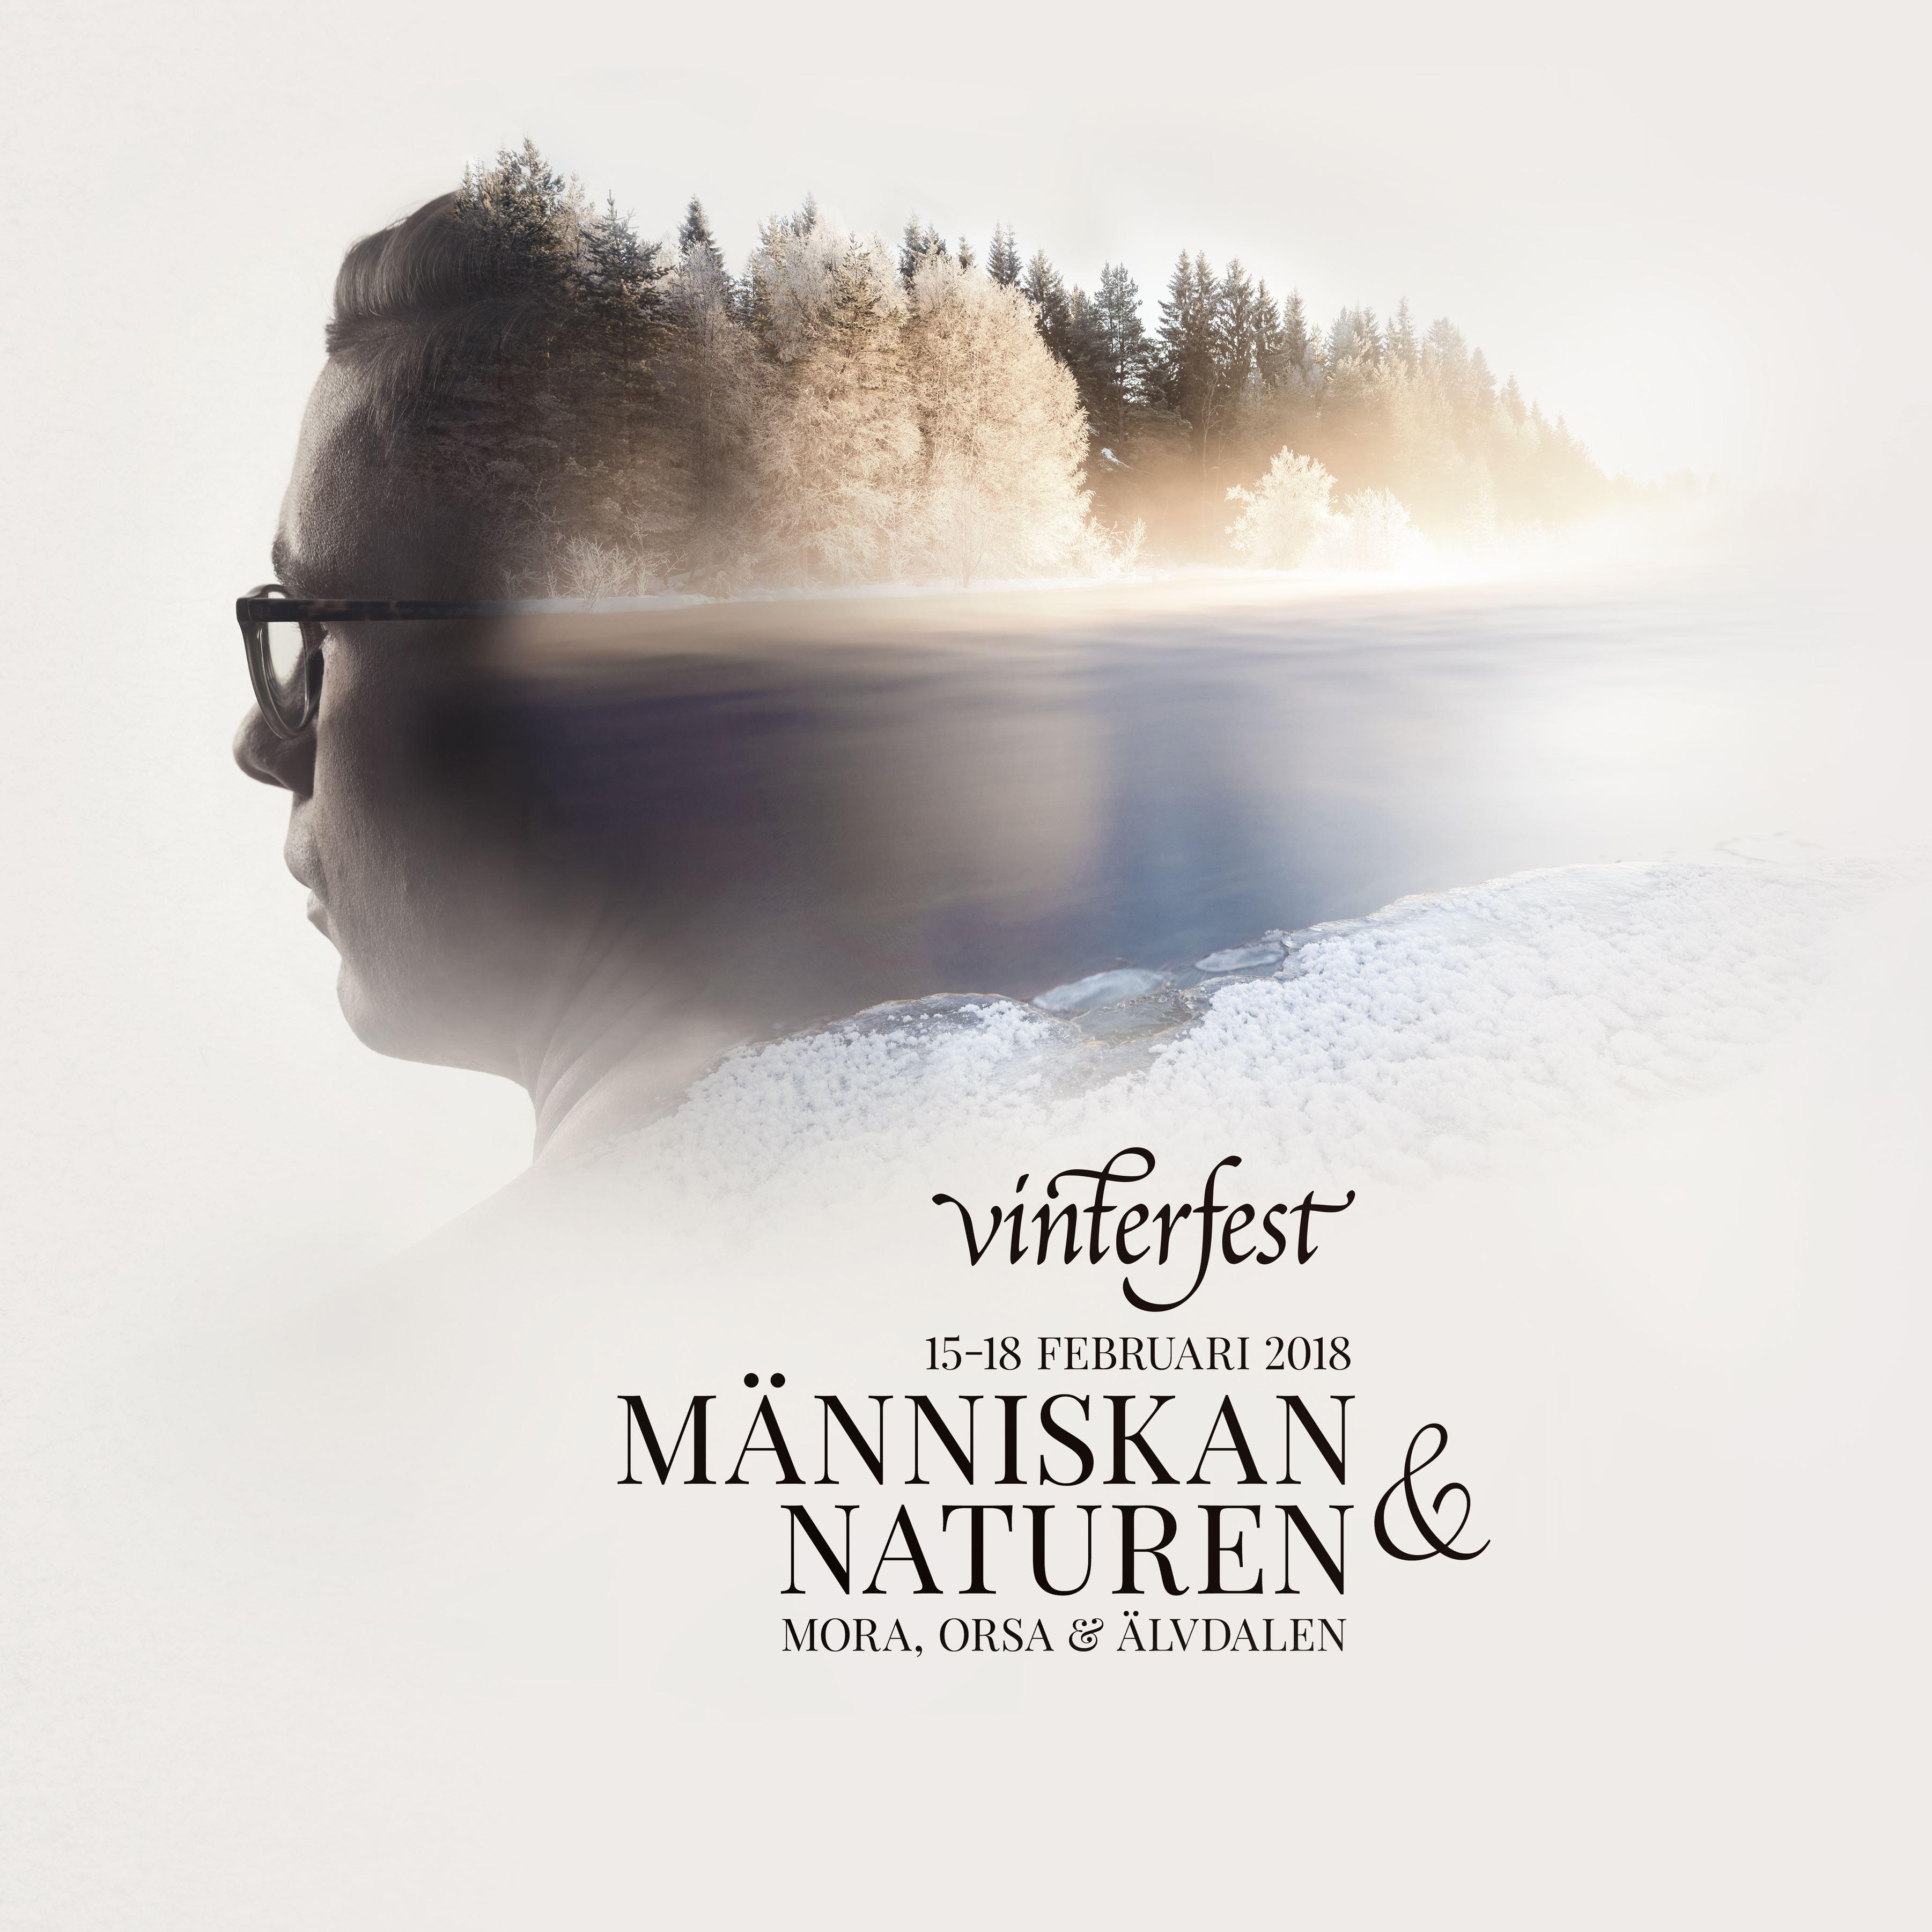 Ari Magg / Mikael Svensson, Vinterfest 2018 - Man and Nature